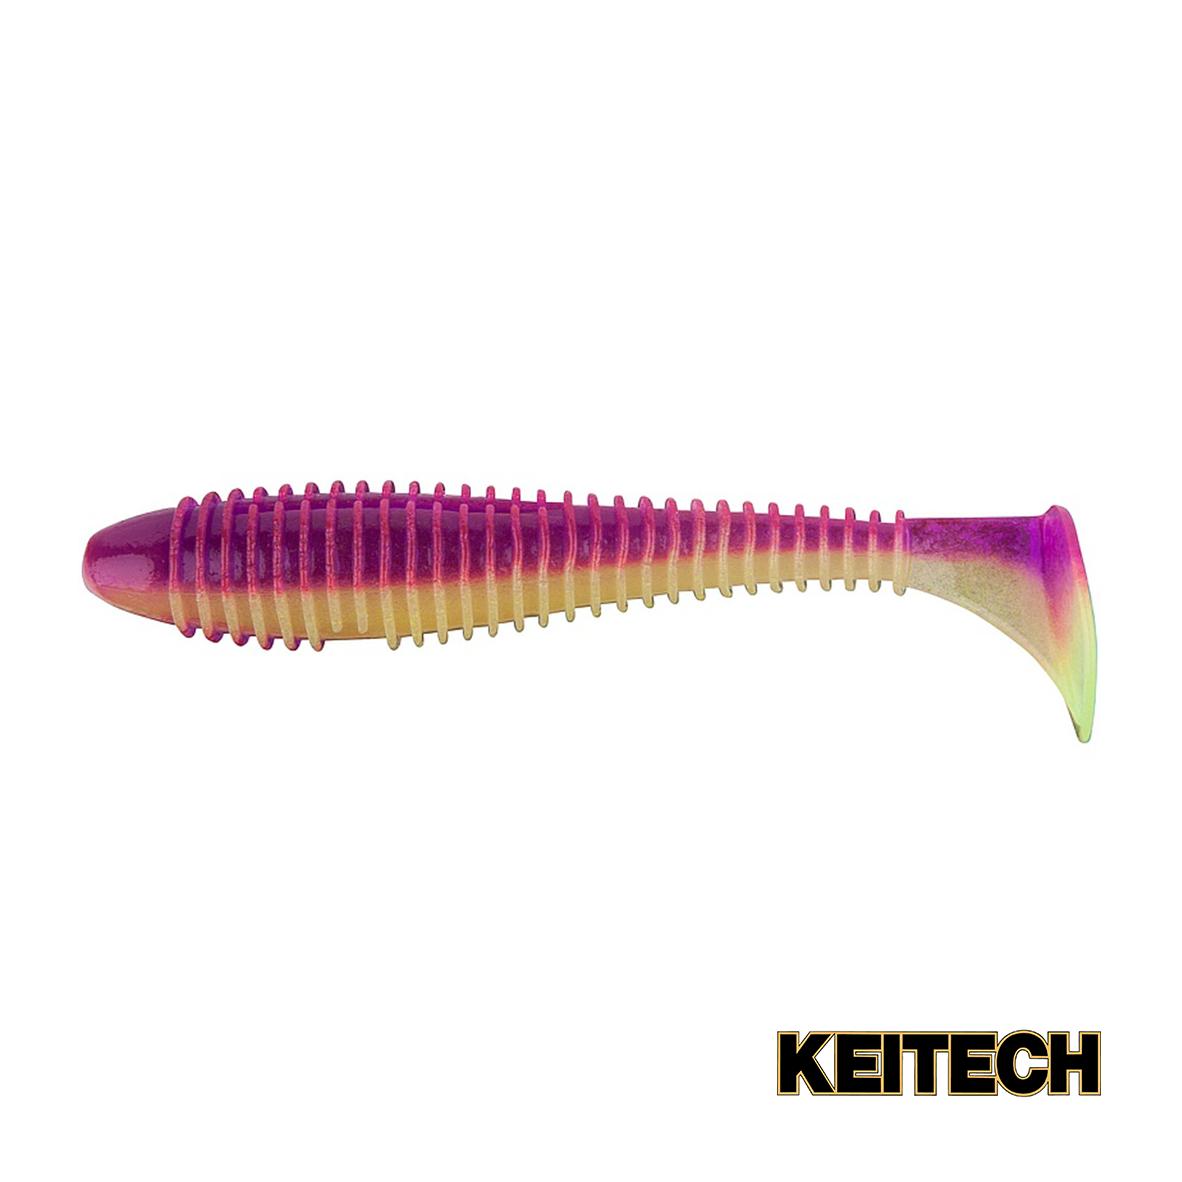 "Силикон Keitech Swing Impact FAT 3.8"" (6 шт/упак) ц:pal#14 glamor"